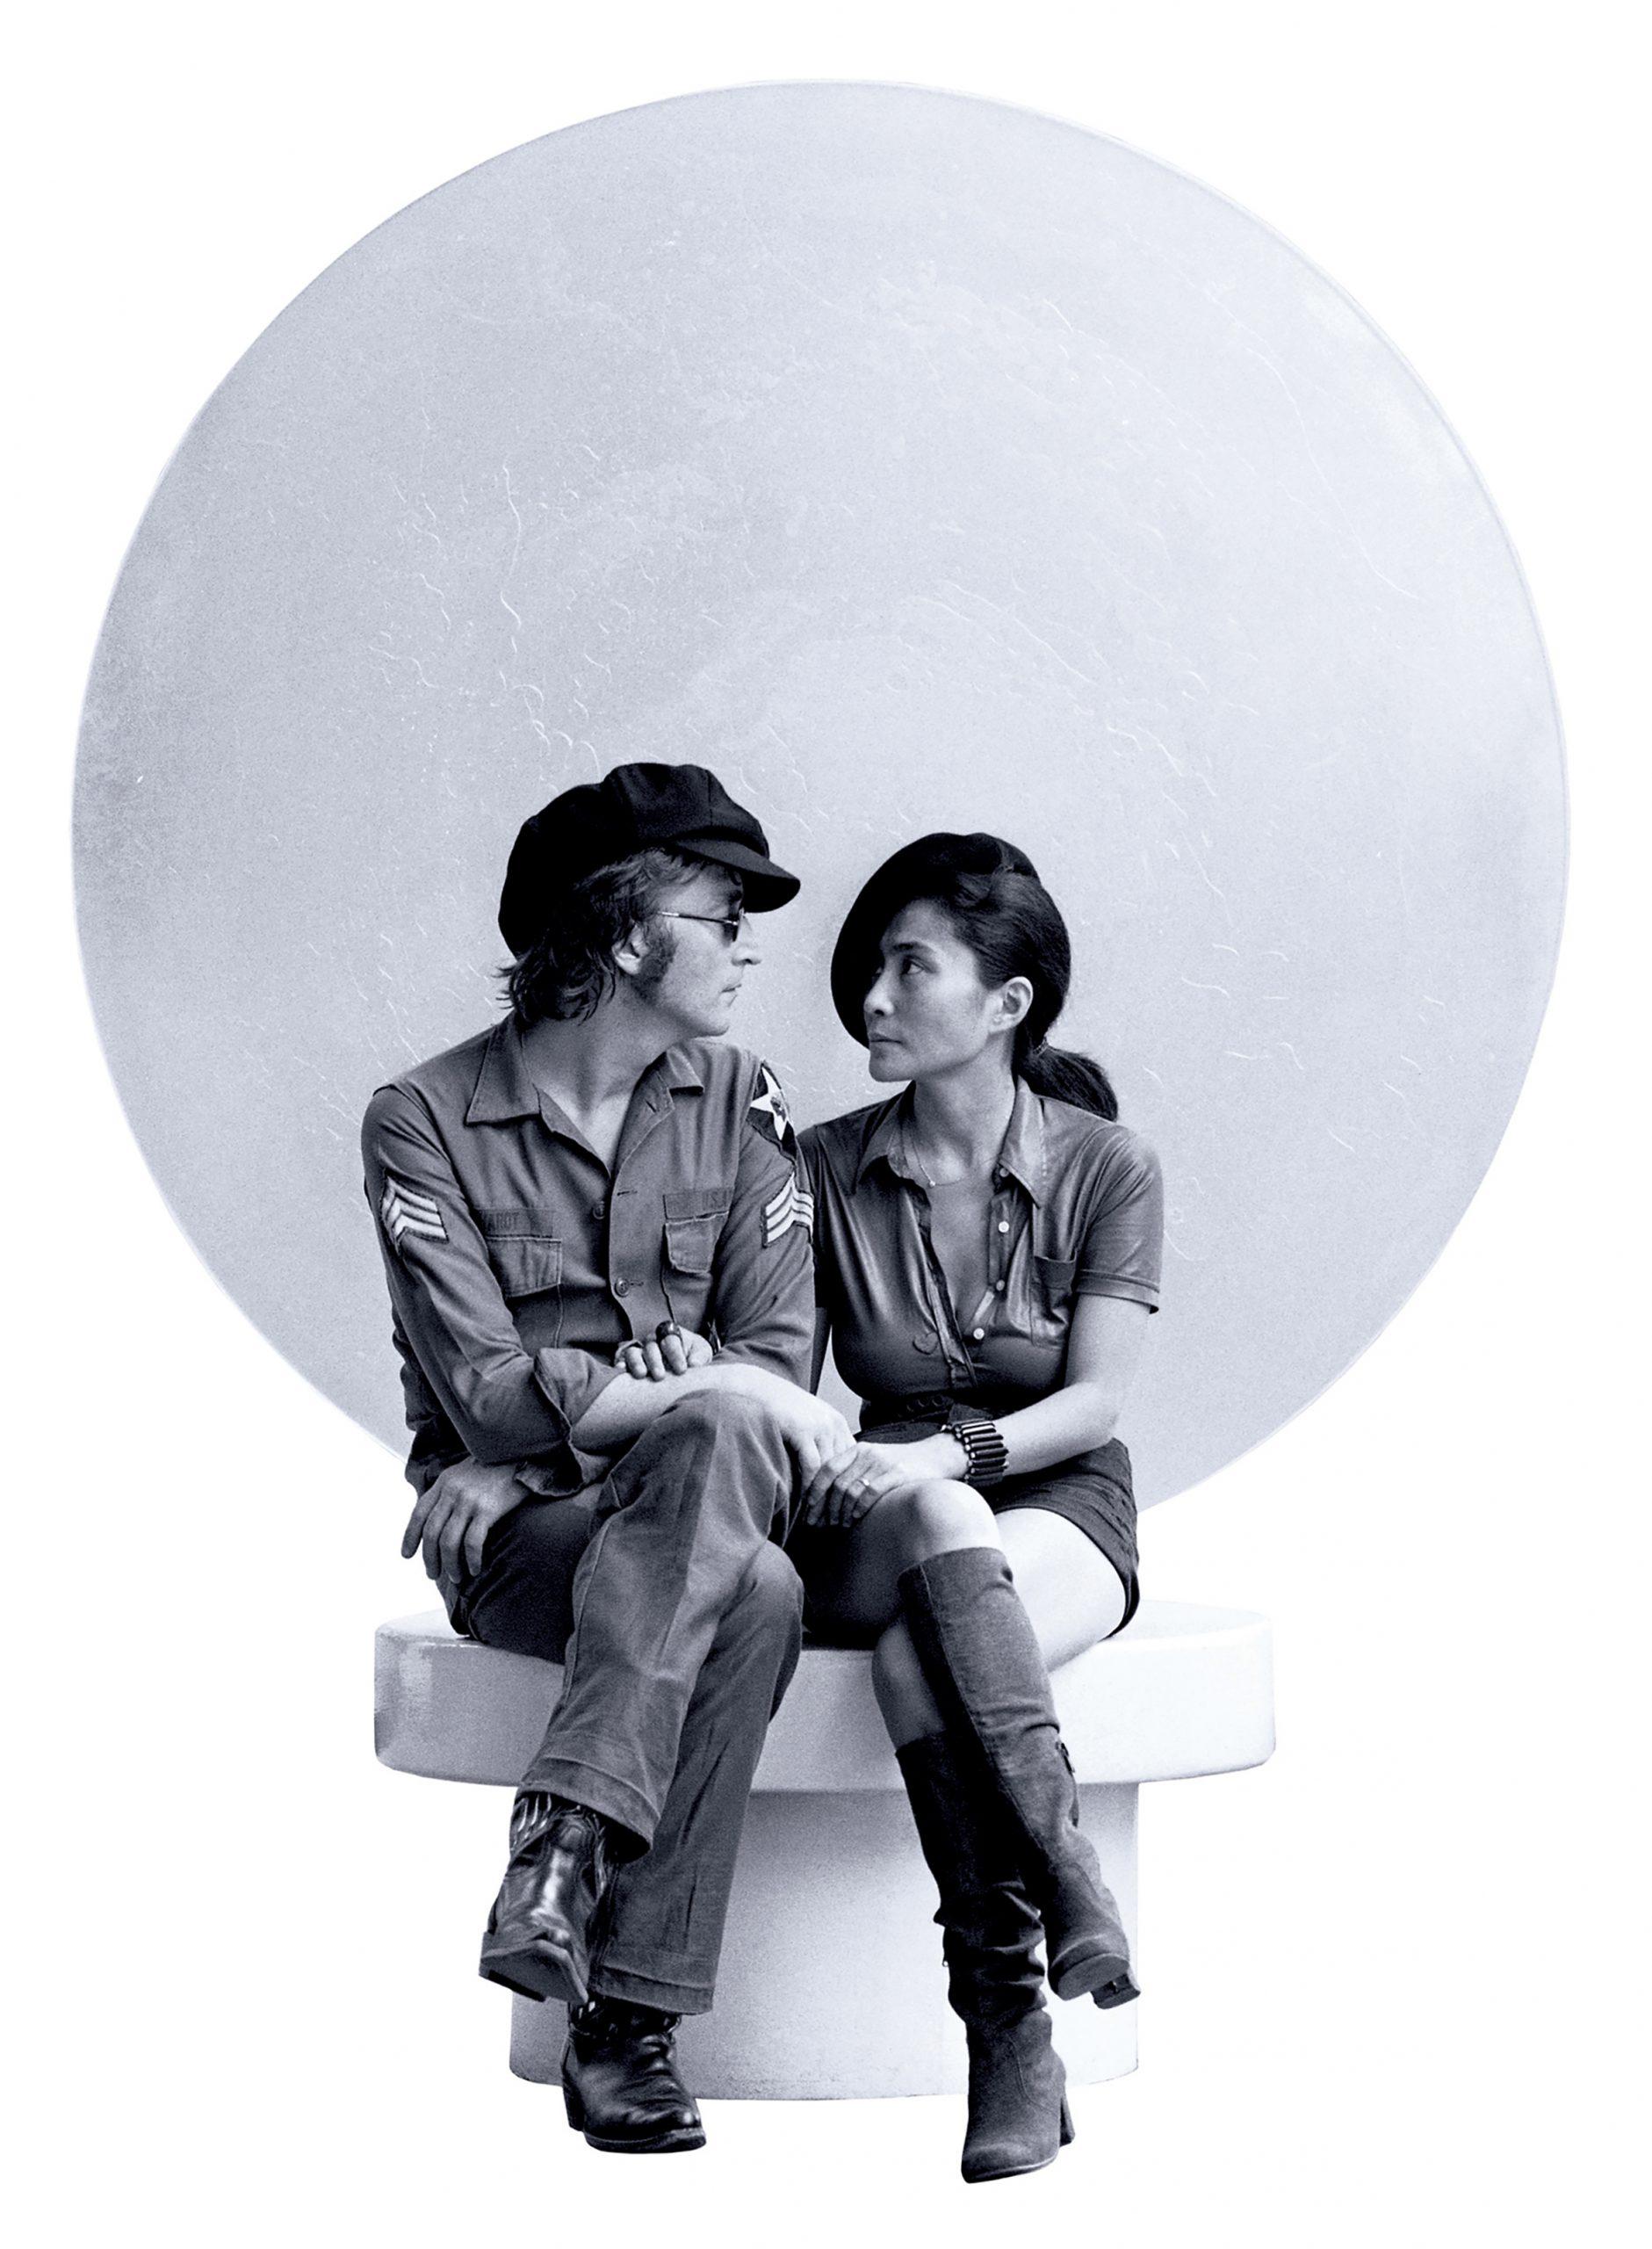 Imagine - John Lennon & Yoko Jono